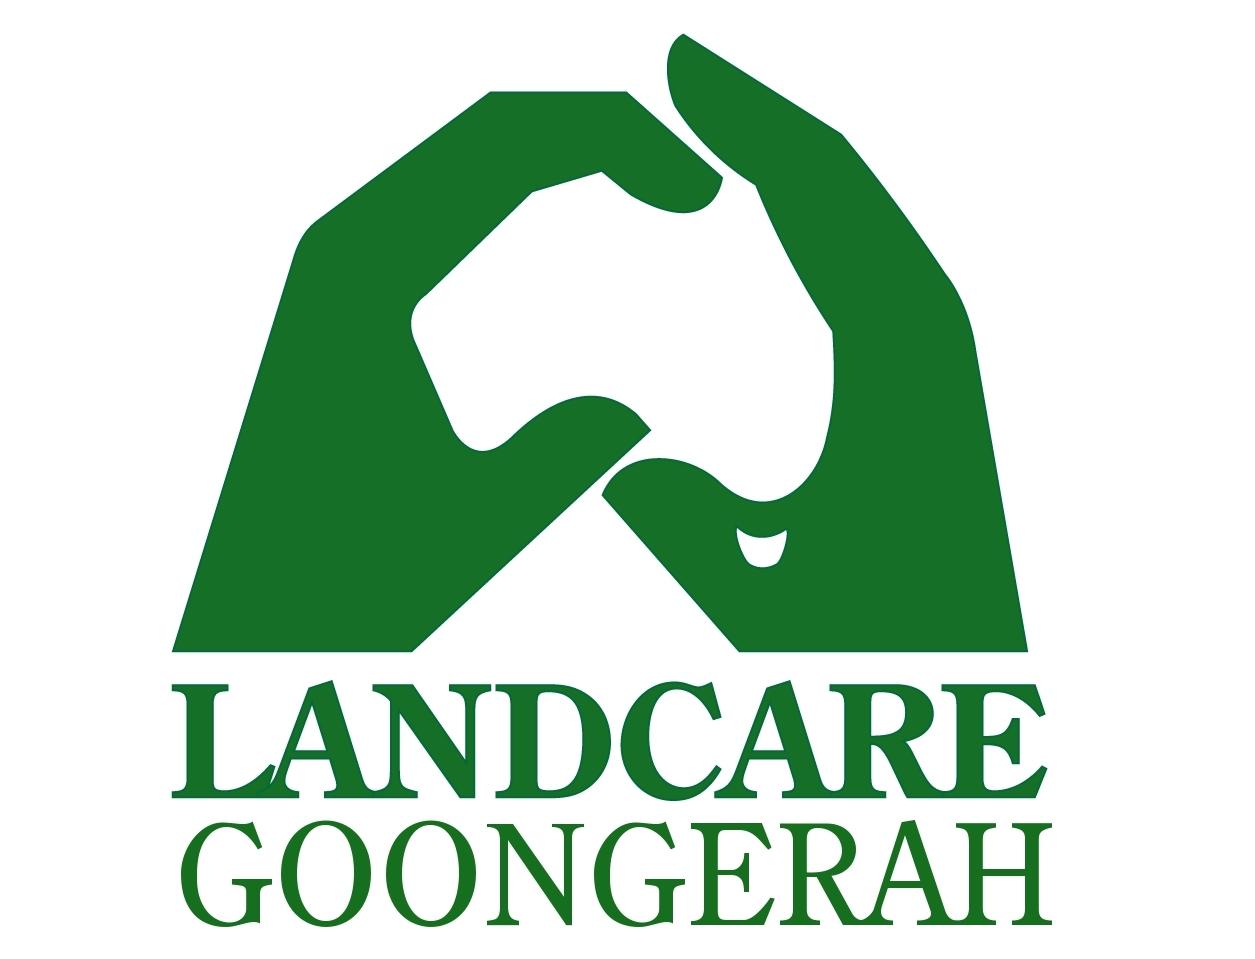 Goongerah_logo.jpg